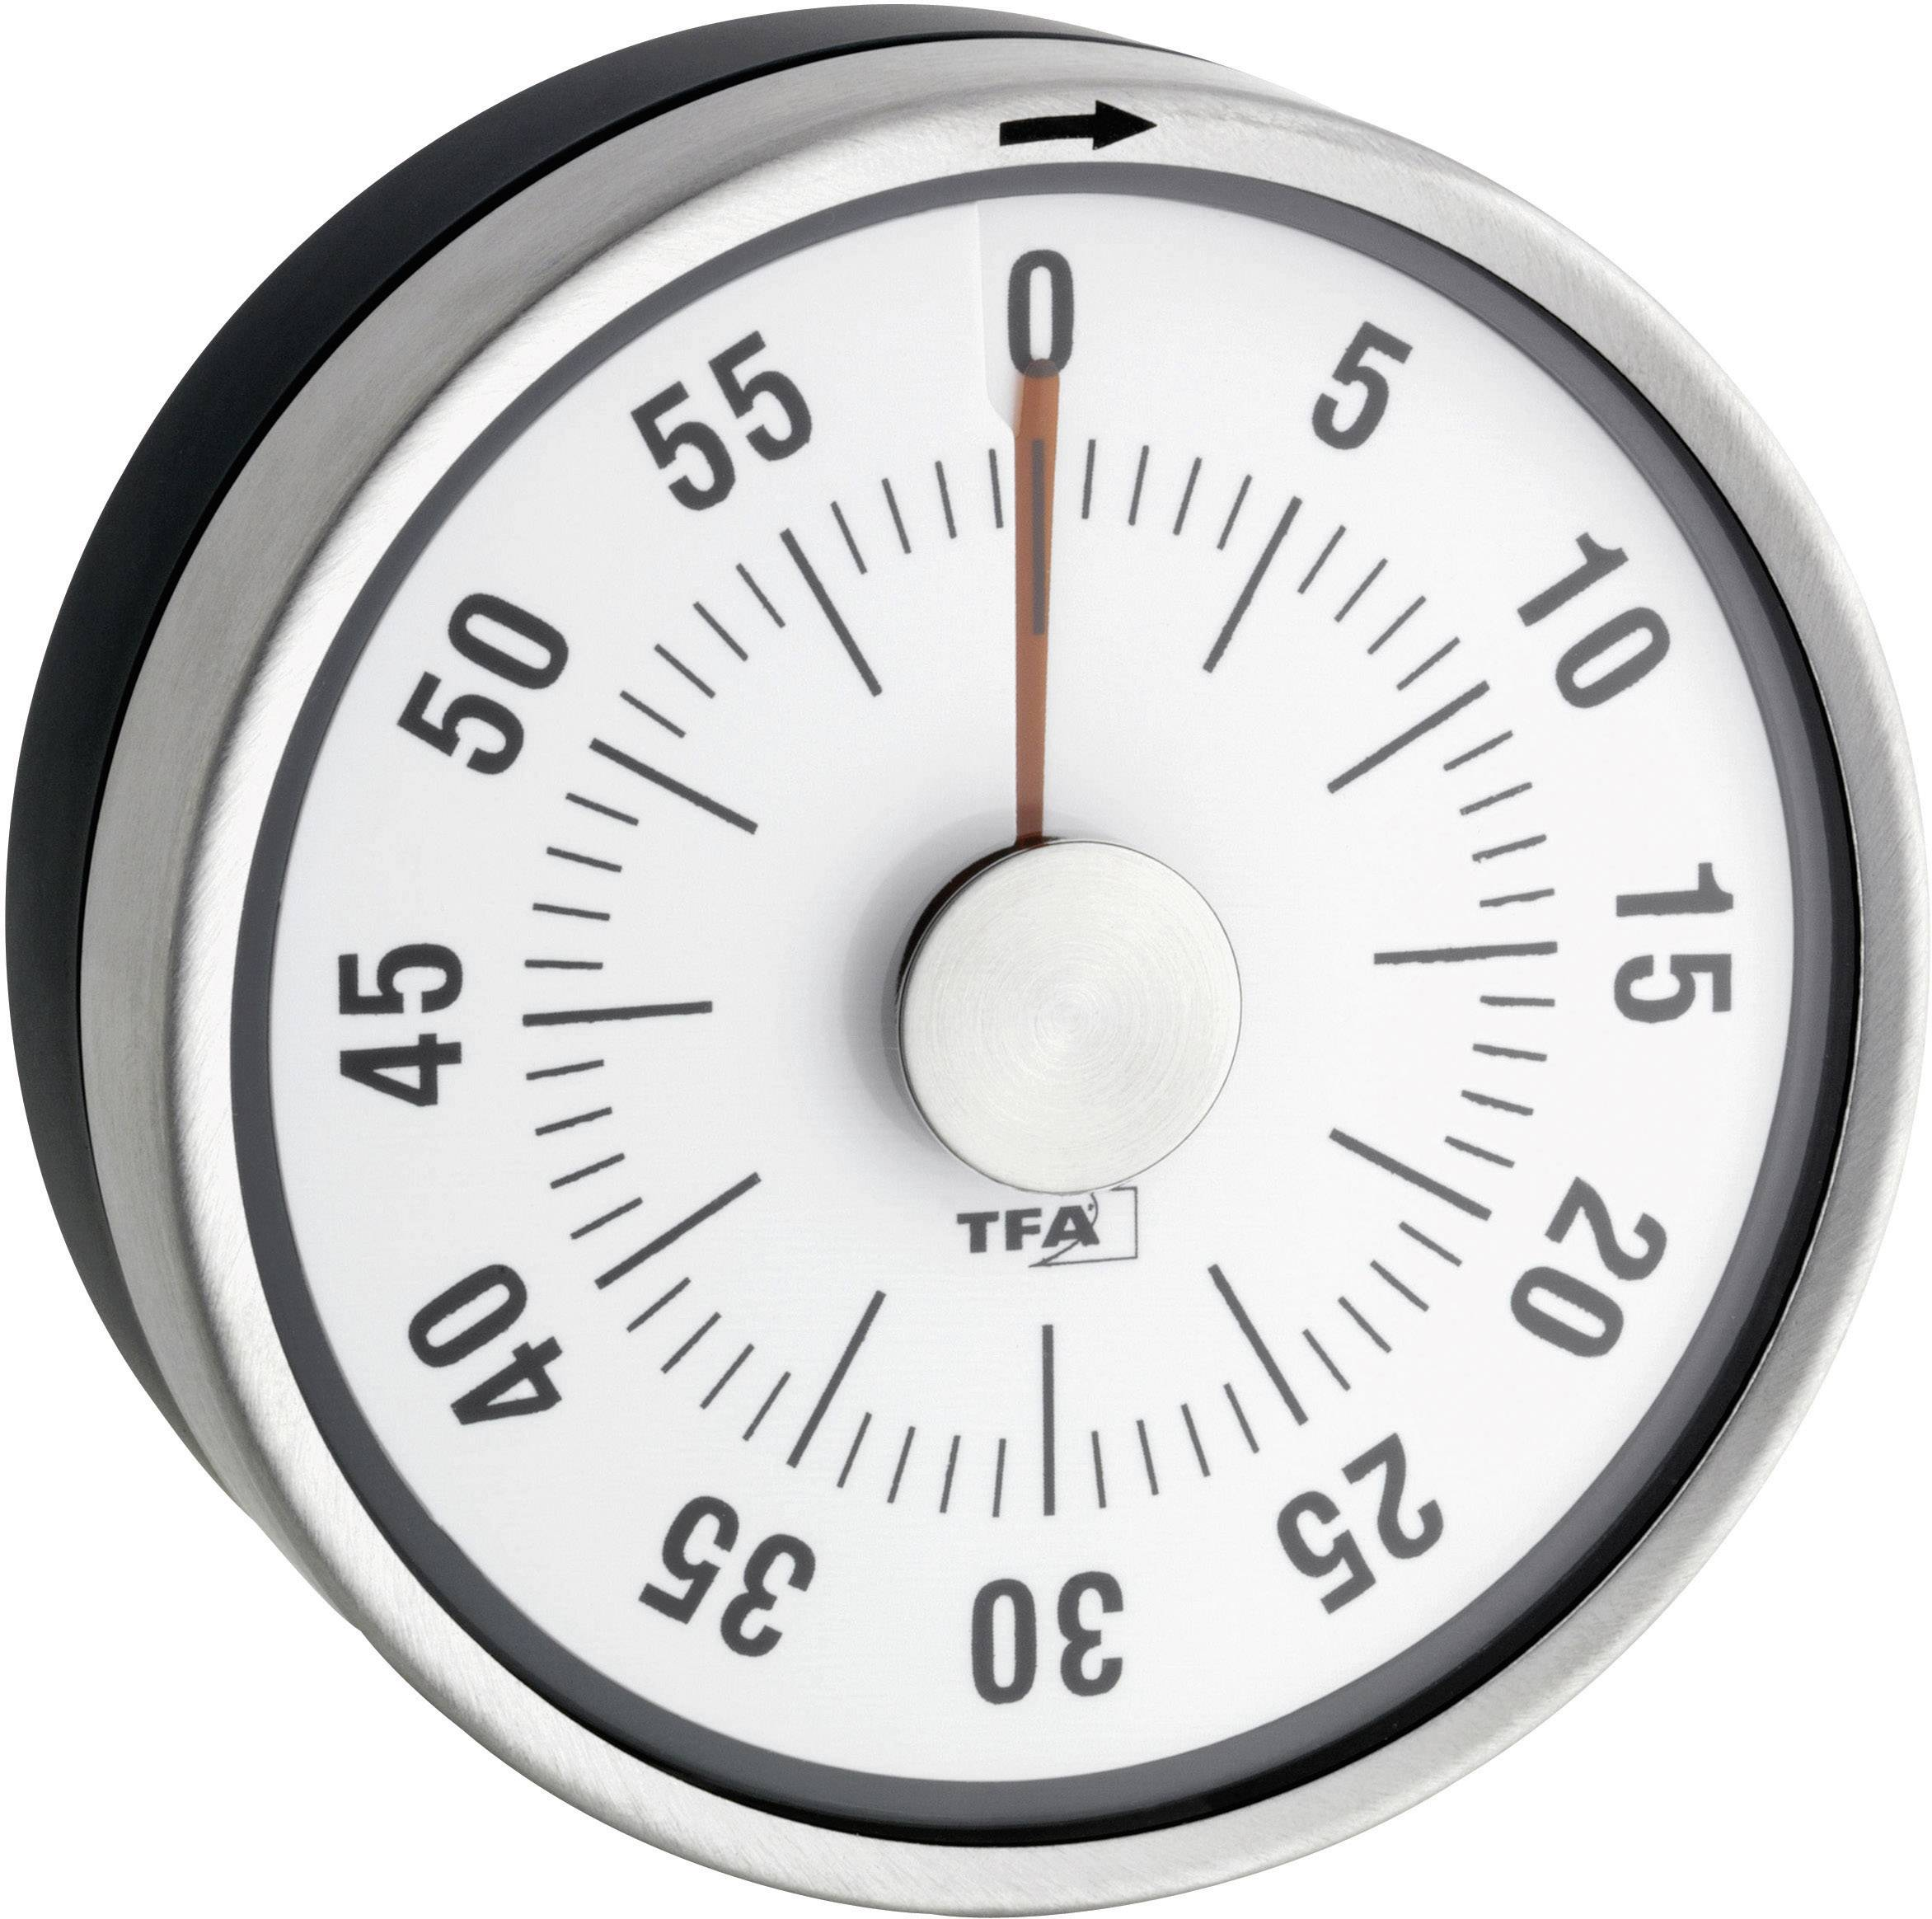 Kuchyňská minutka Puck TFA, 38-1028-10, 79 x 33 mm, antracit